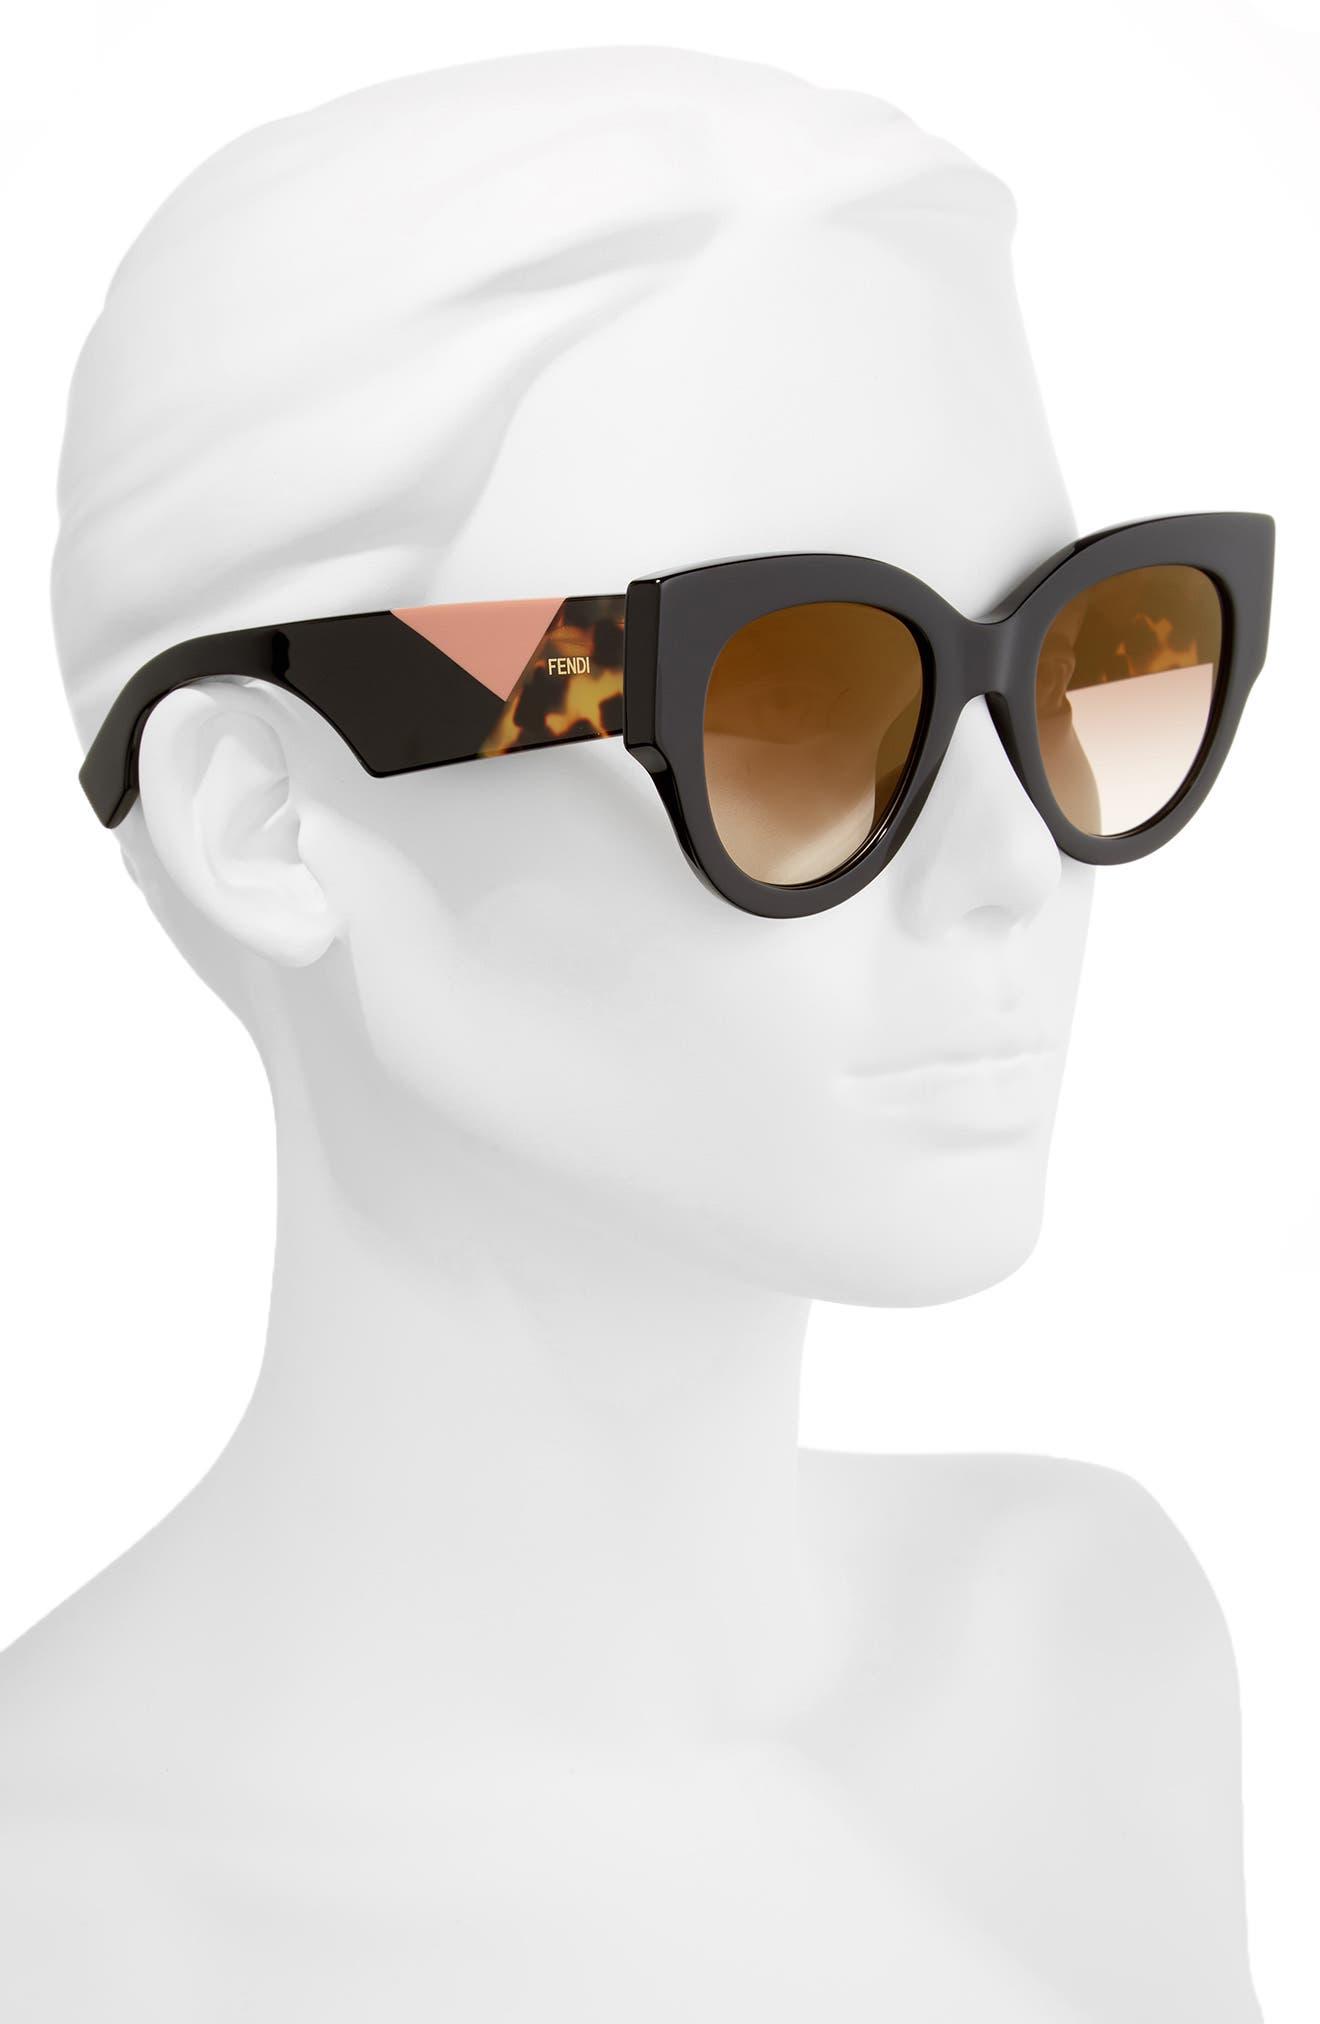 51mm Cat Eye Sunglasses,                             Alternate thumbnail 2, color,                             001